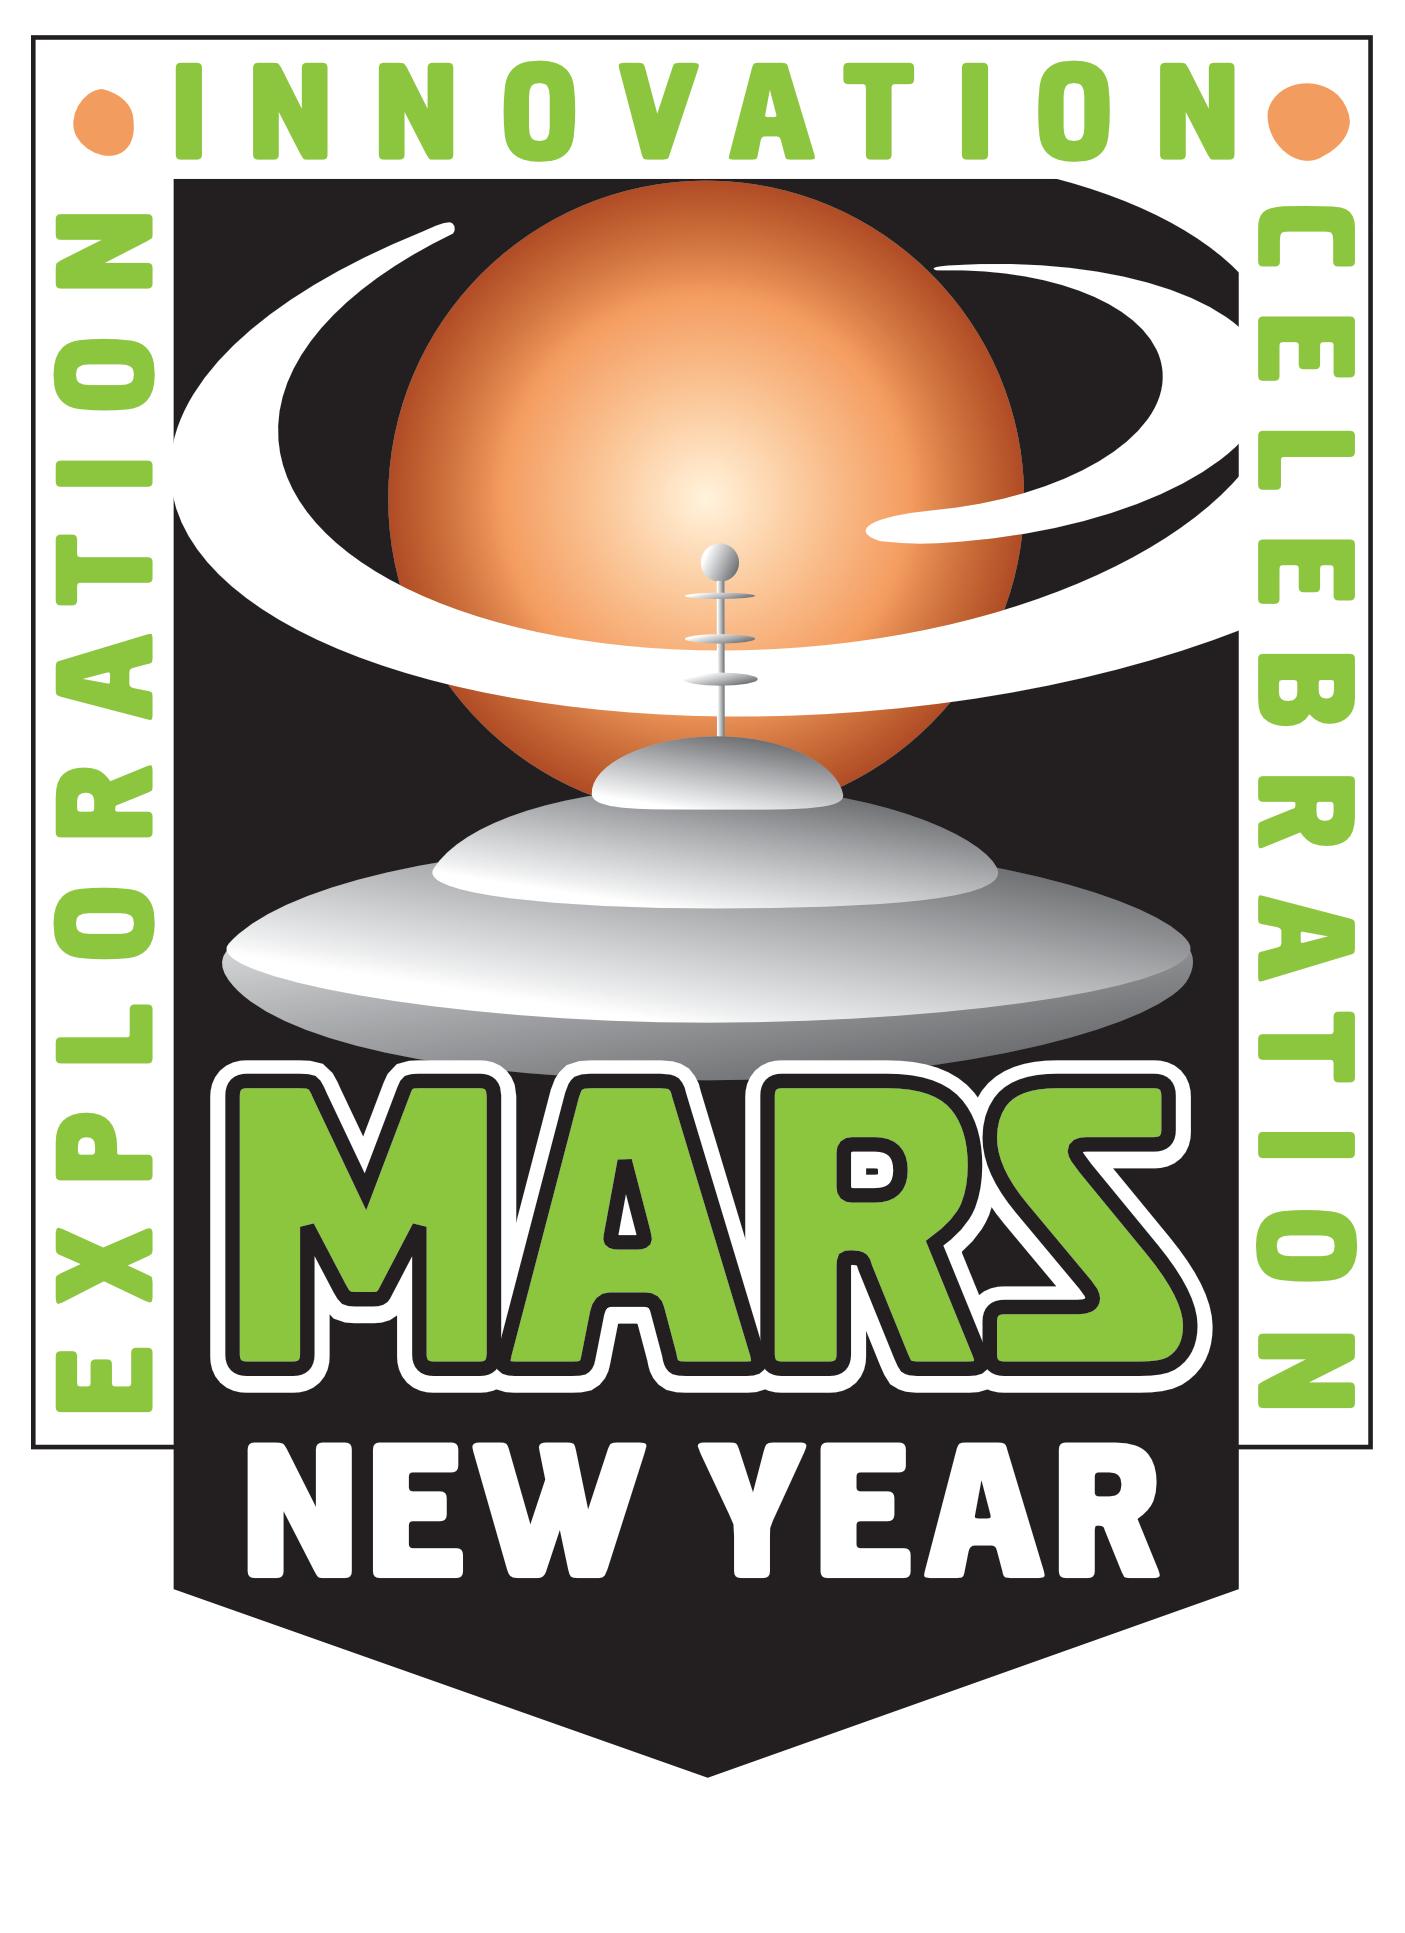 Mars New Year